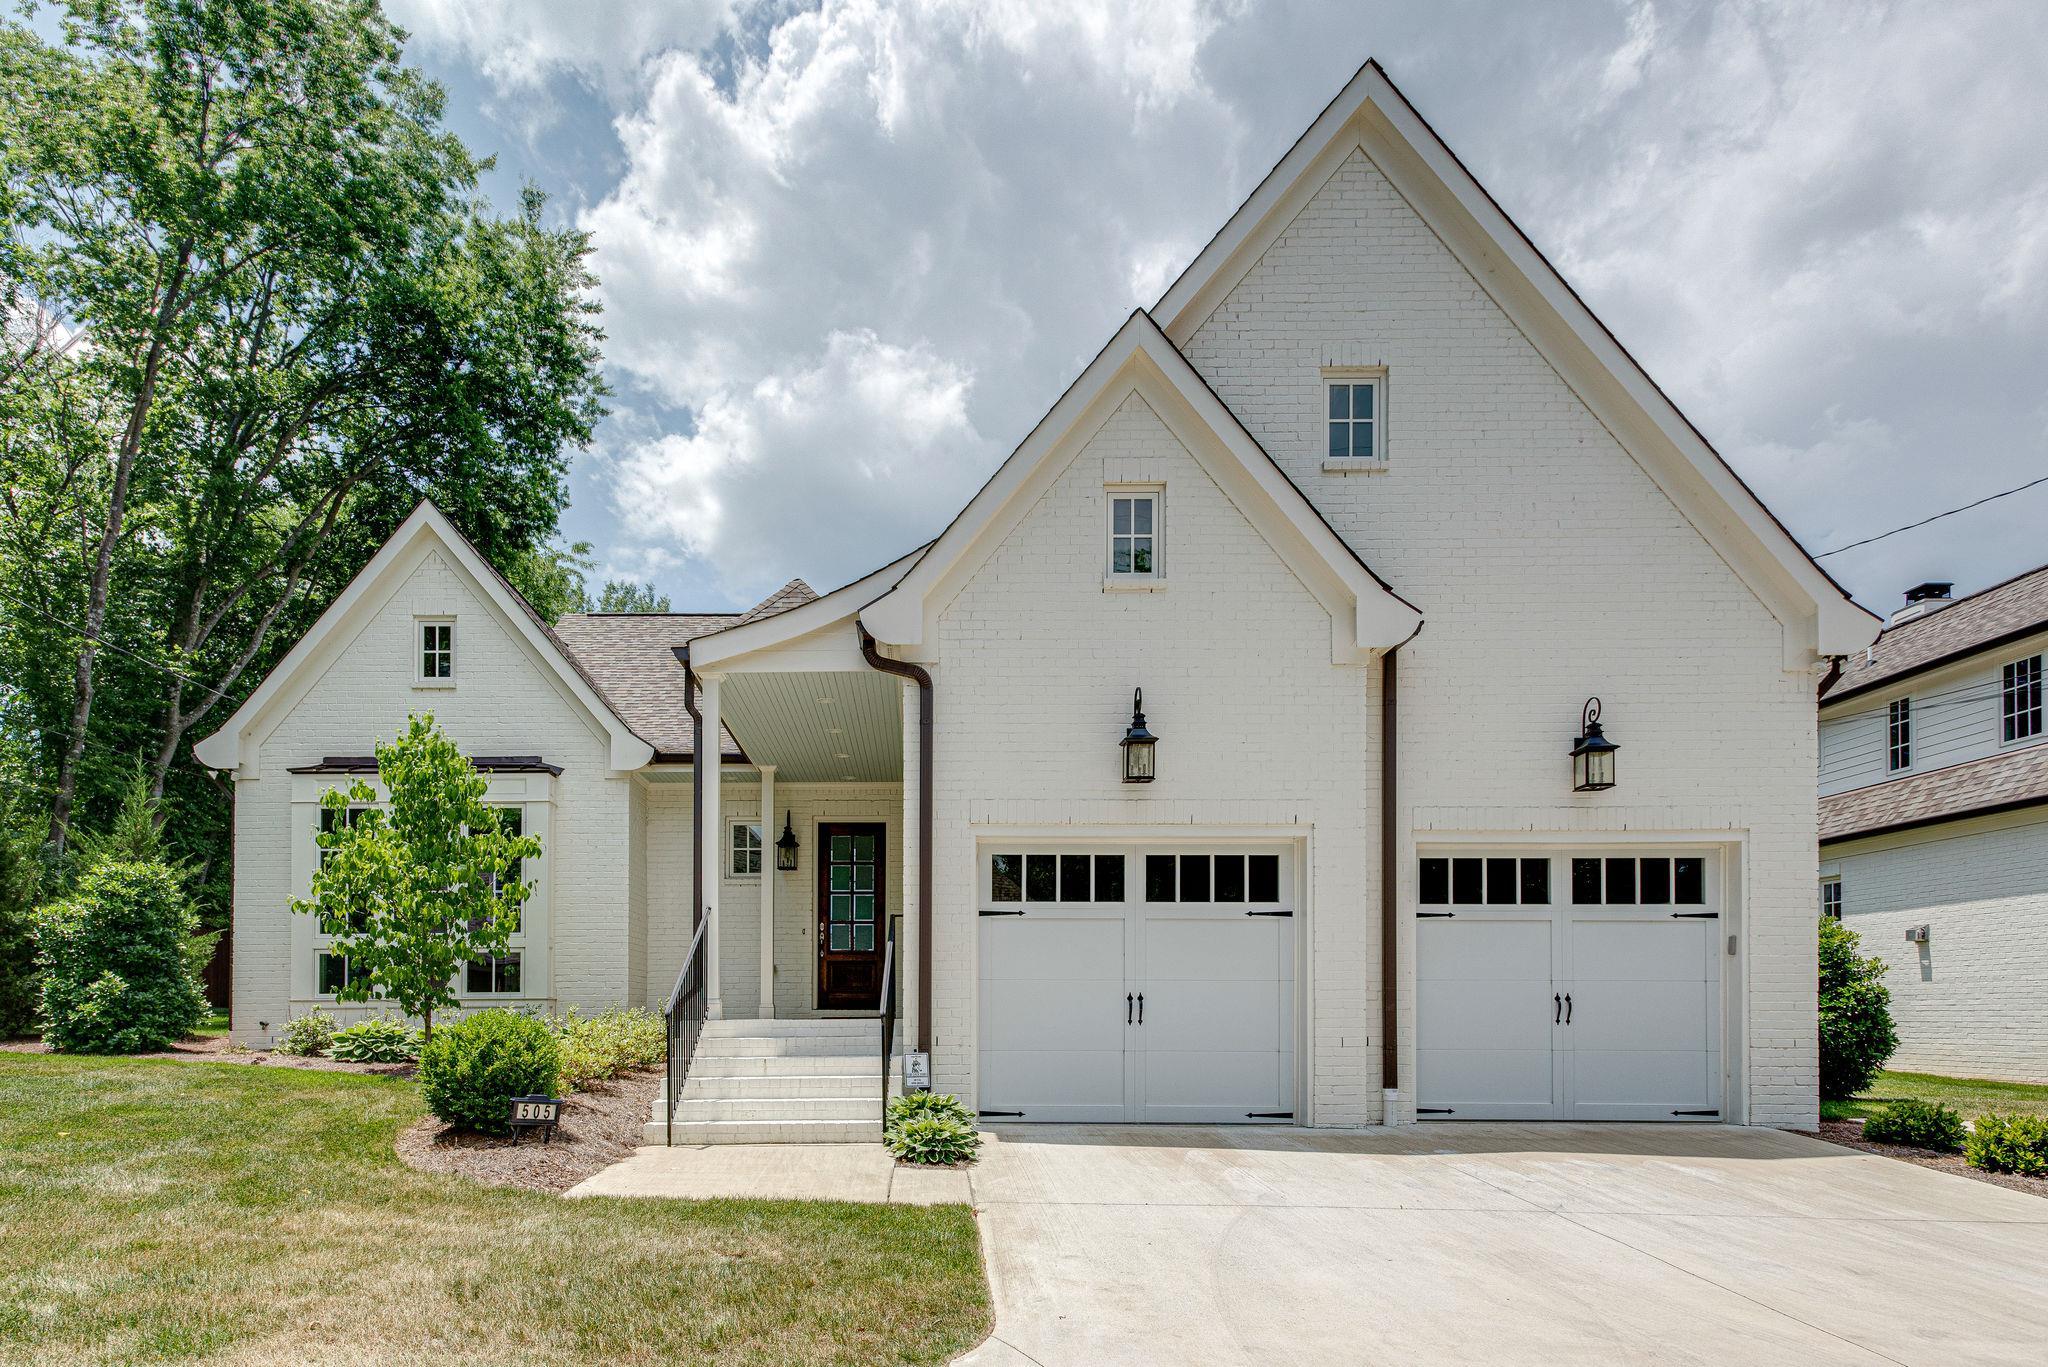 505 Tyne Ct, Nashville, TN 37205 - Nashville, TN real estate listing